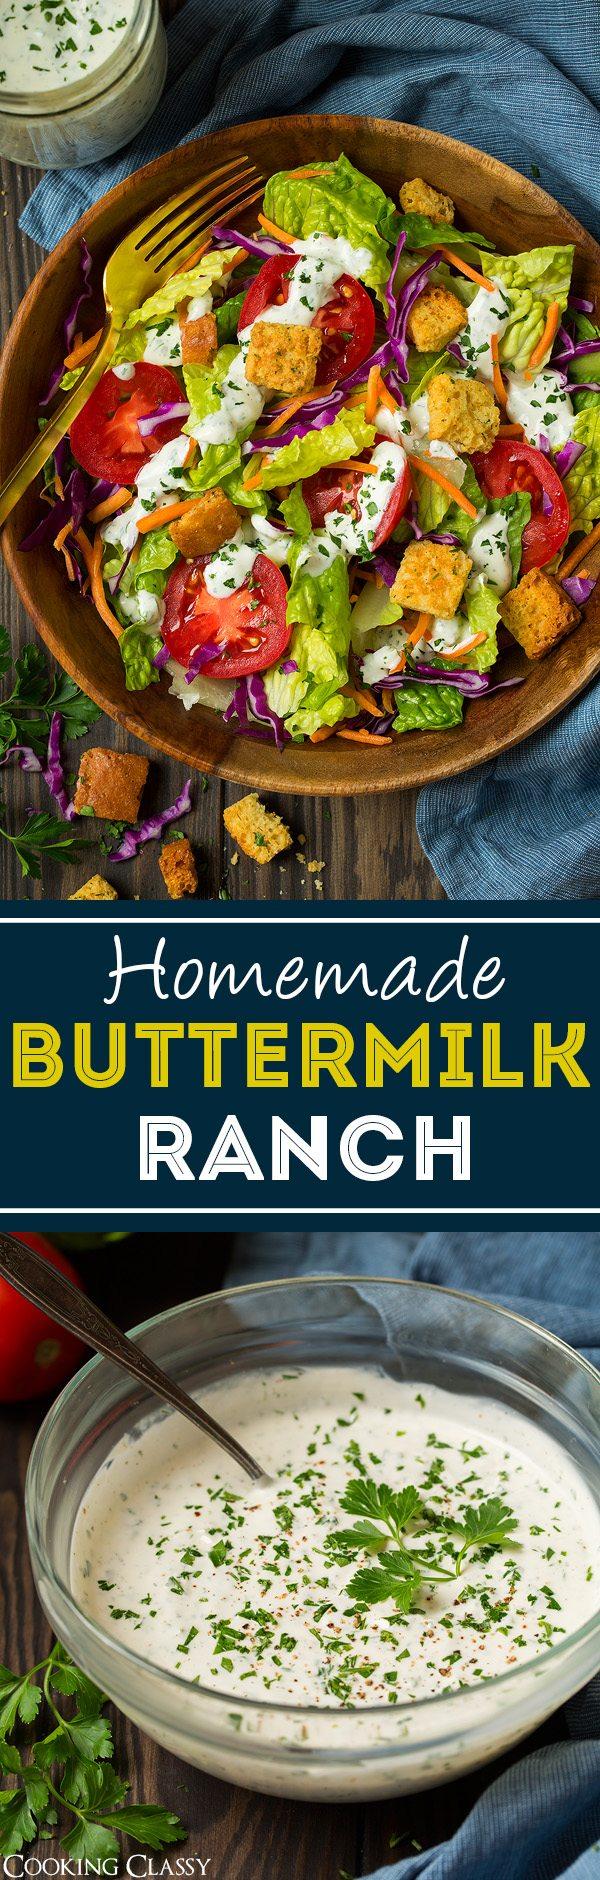 Homemade Buttermilk Ranch | Cooking Classy